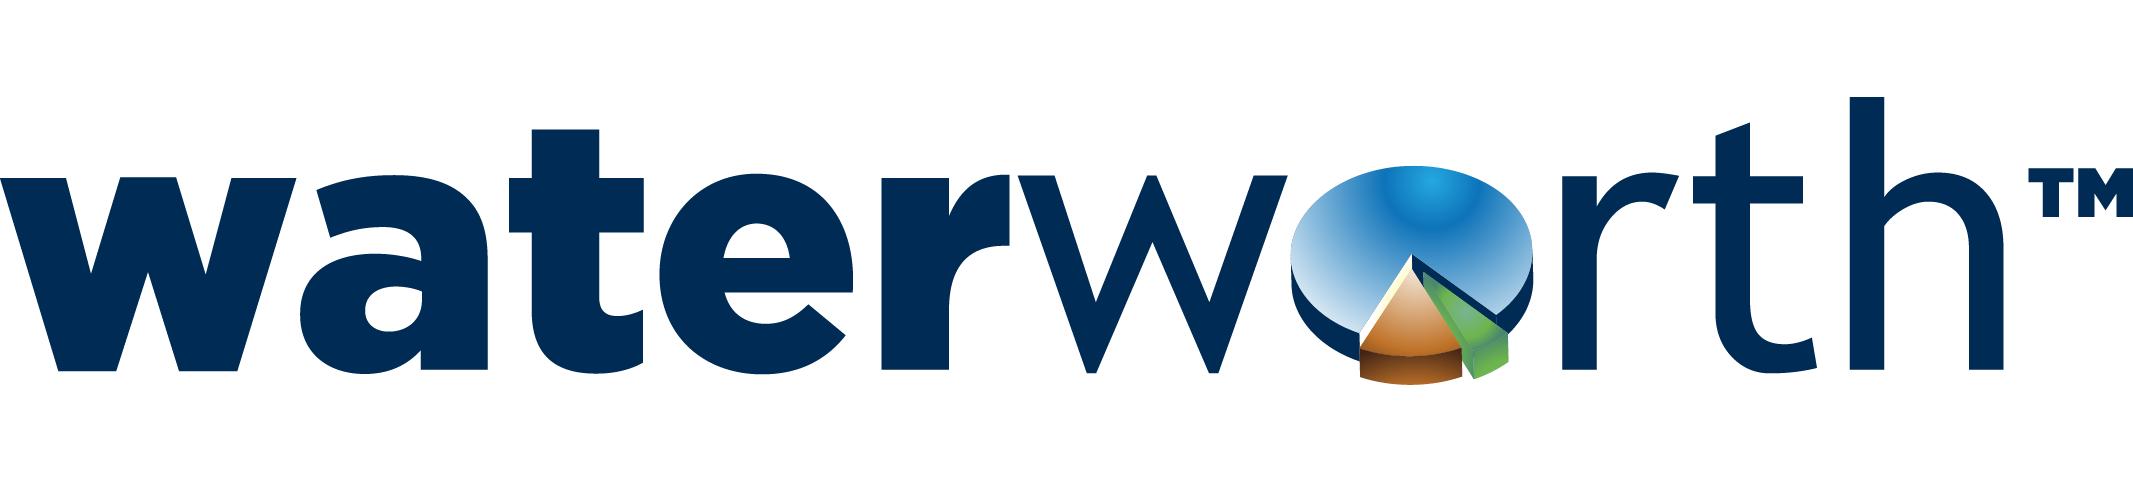 waterworth logo